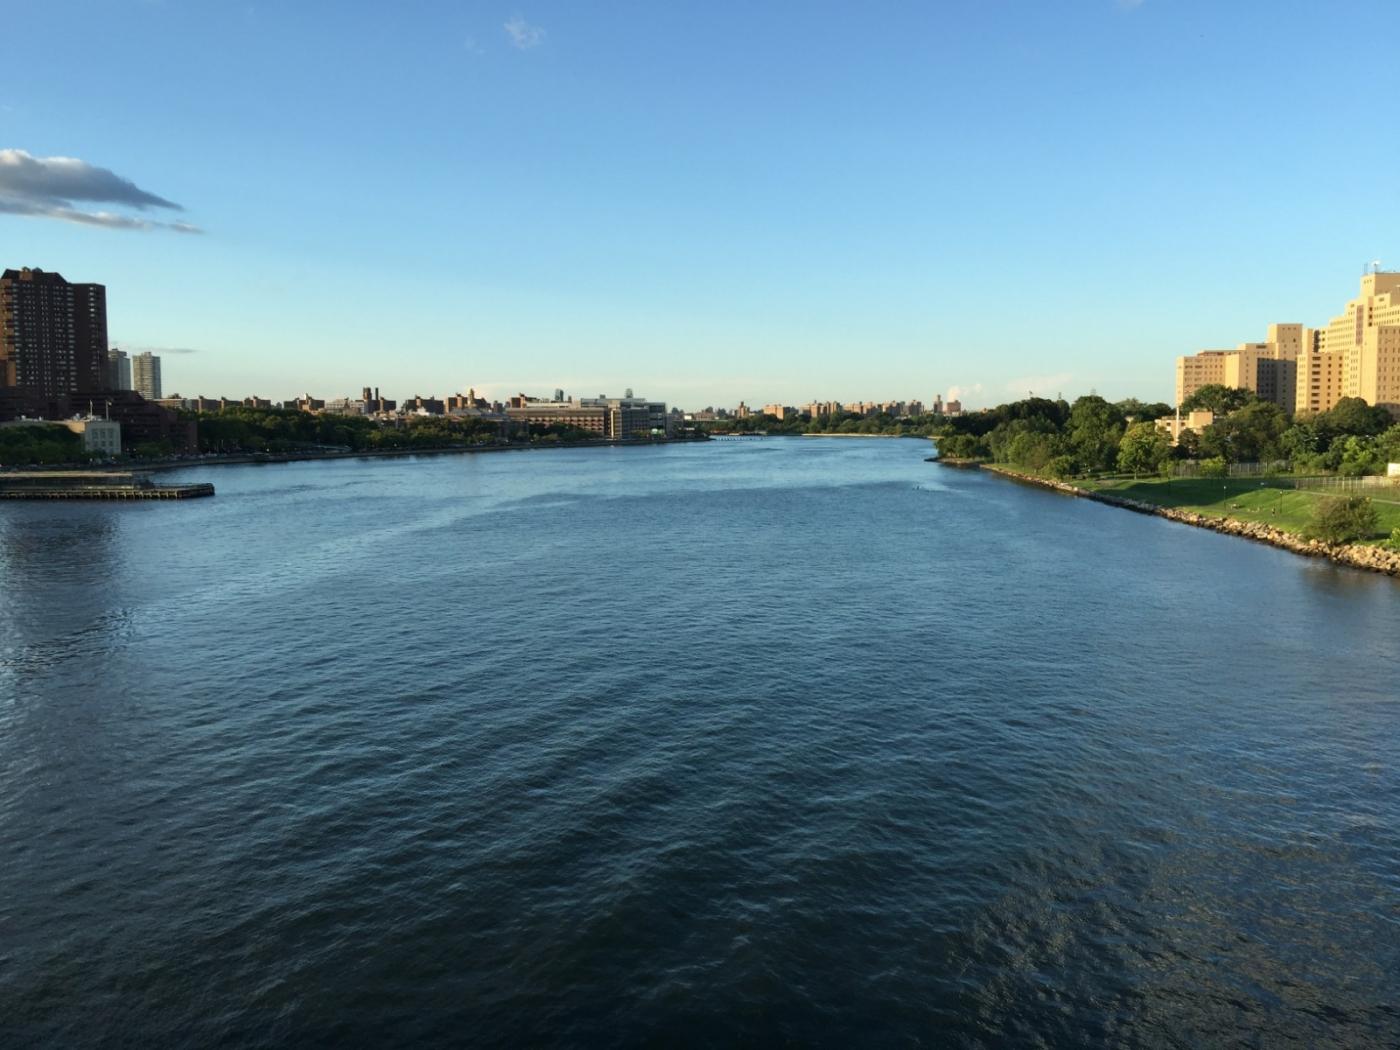 回头一瞅 美在东河 Manhattan East River_图1-16